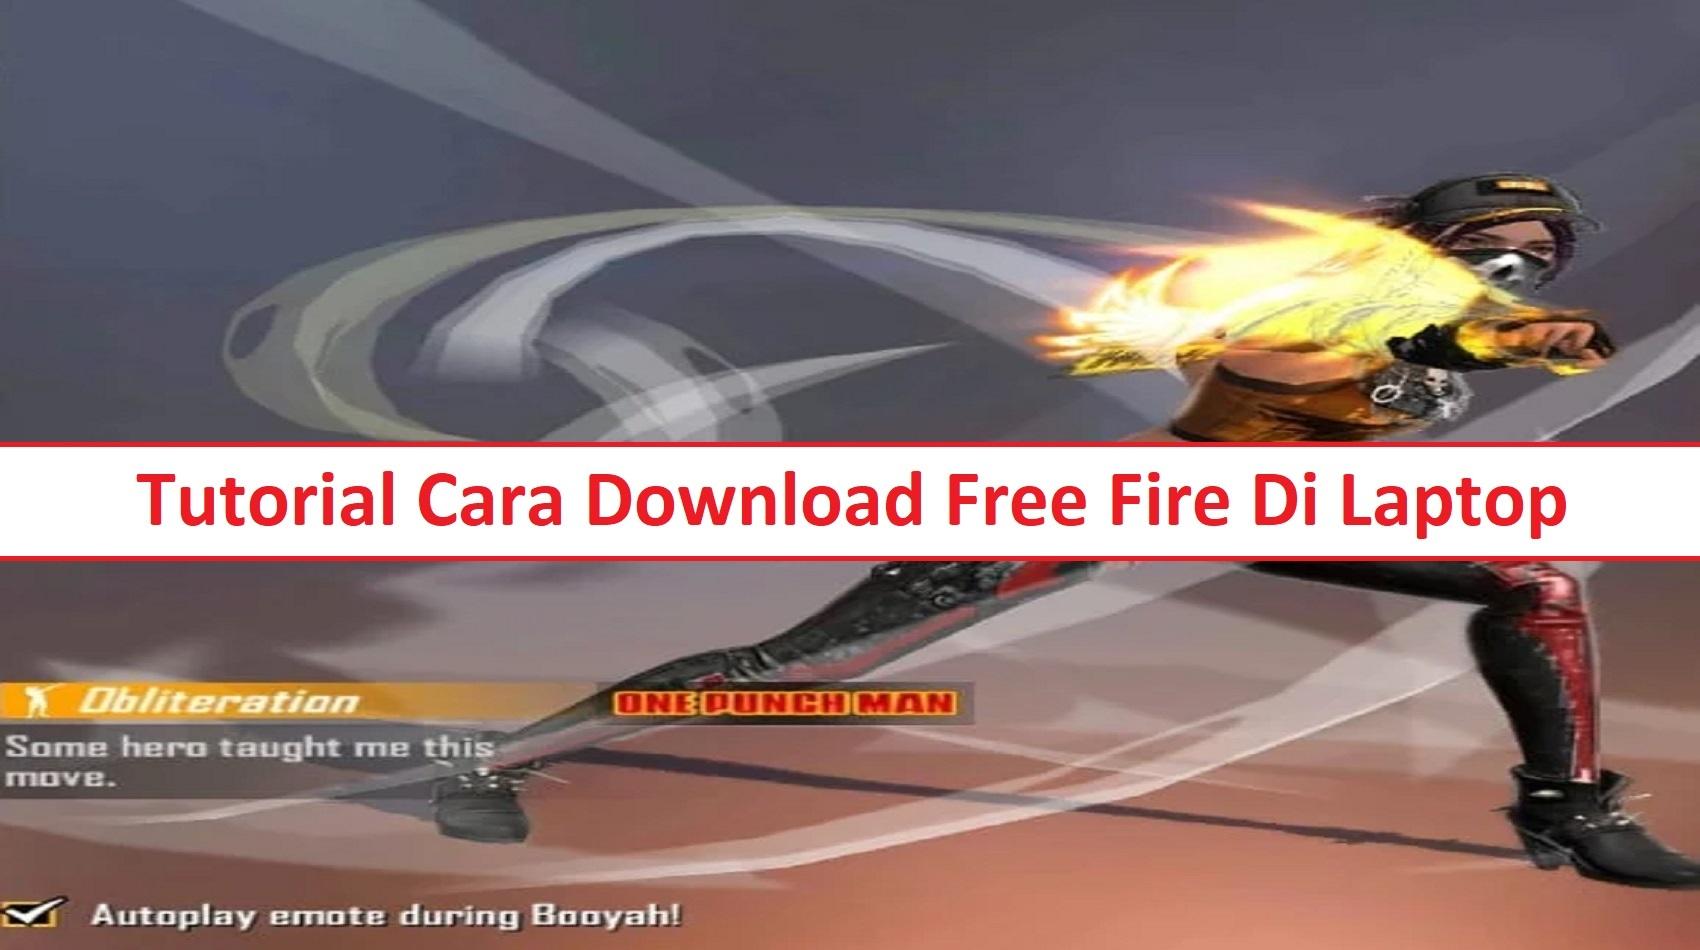 Tutorial Cara Download Free Fire Di Laptop Terbaru 2021 Esportsku